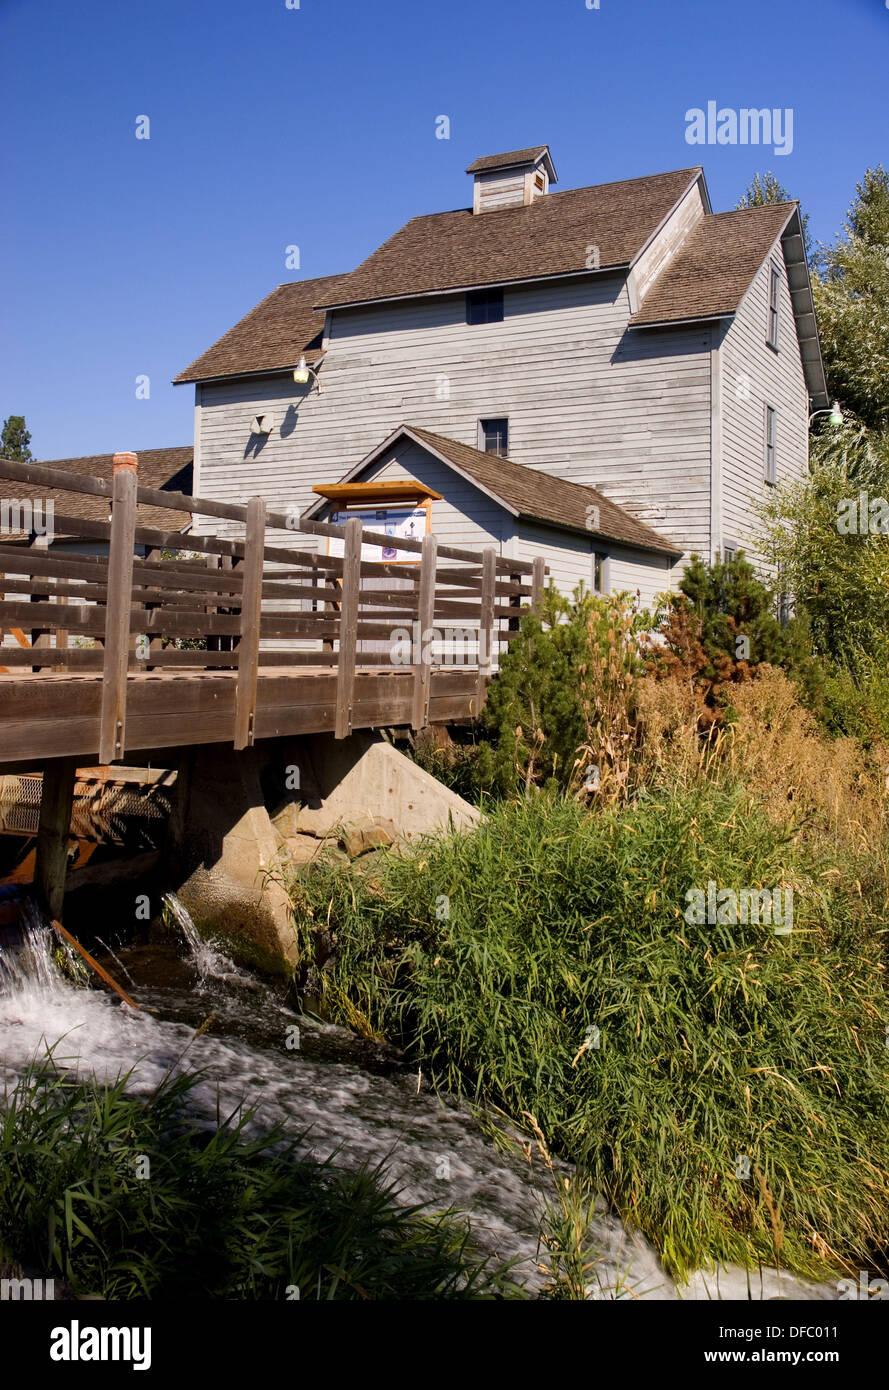 Thorpe Grist Mill, Thorpe, Washington, USA Stockfoto